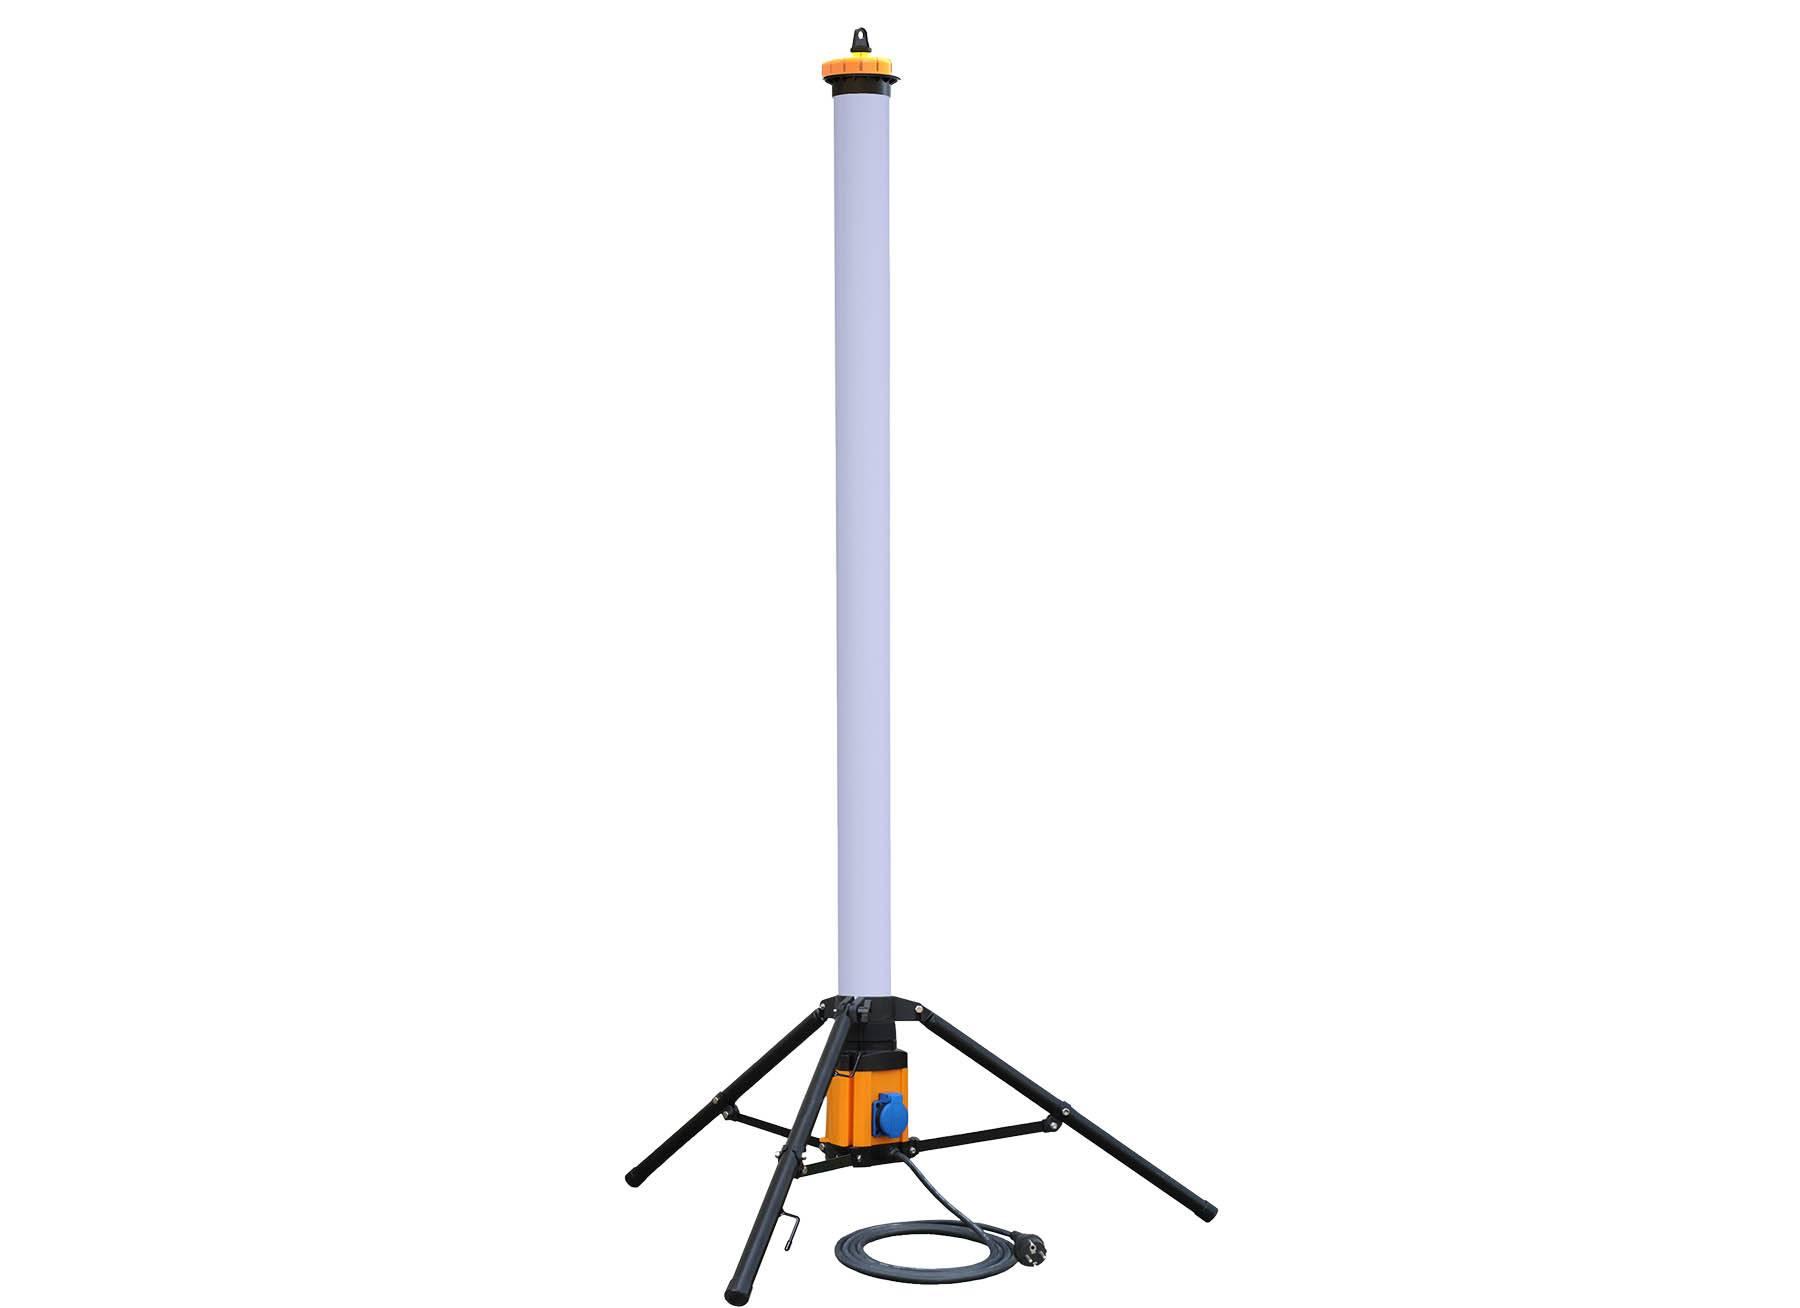 LED Säule 158cm 54W 360°Ausleuchtung IP54 5.000lm